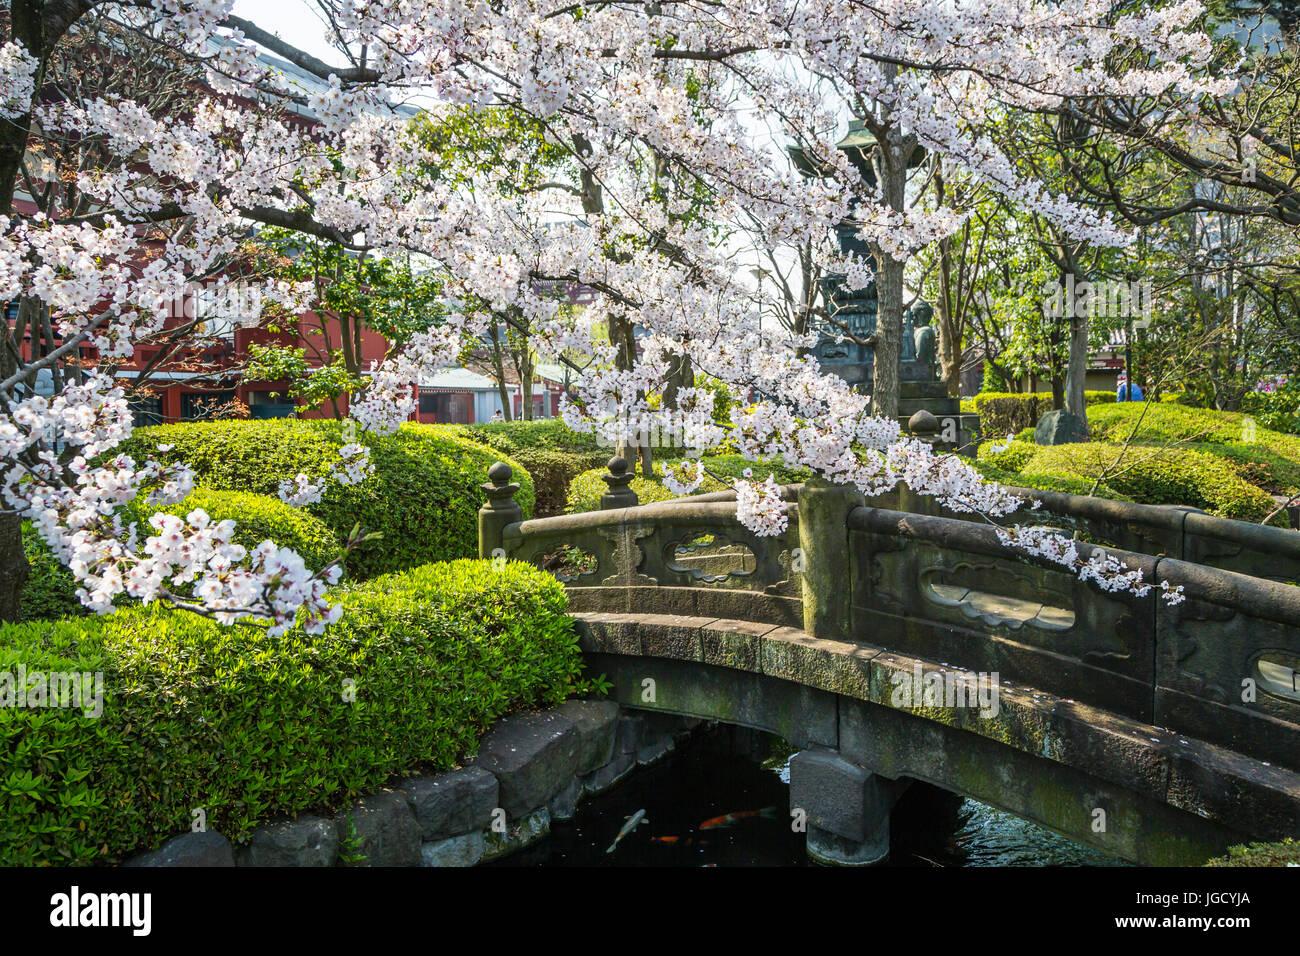 A Stone Bridge With Cherry Blossom Trees In Asakusa Tokyo Japan